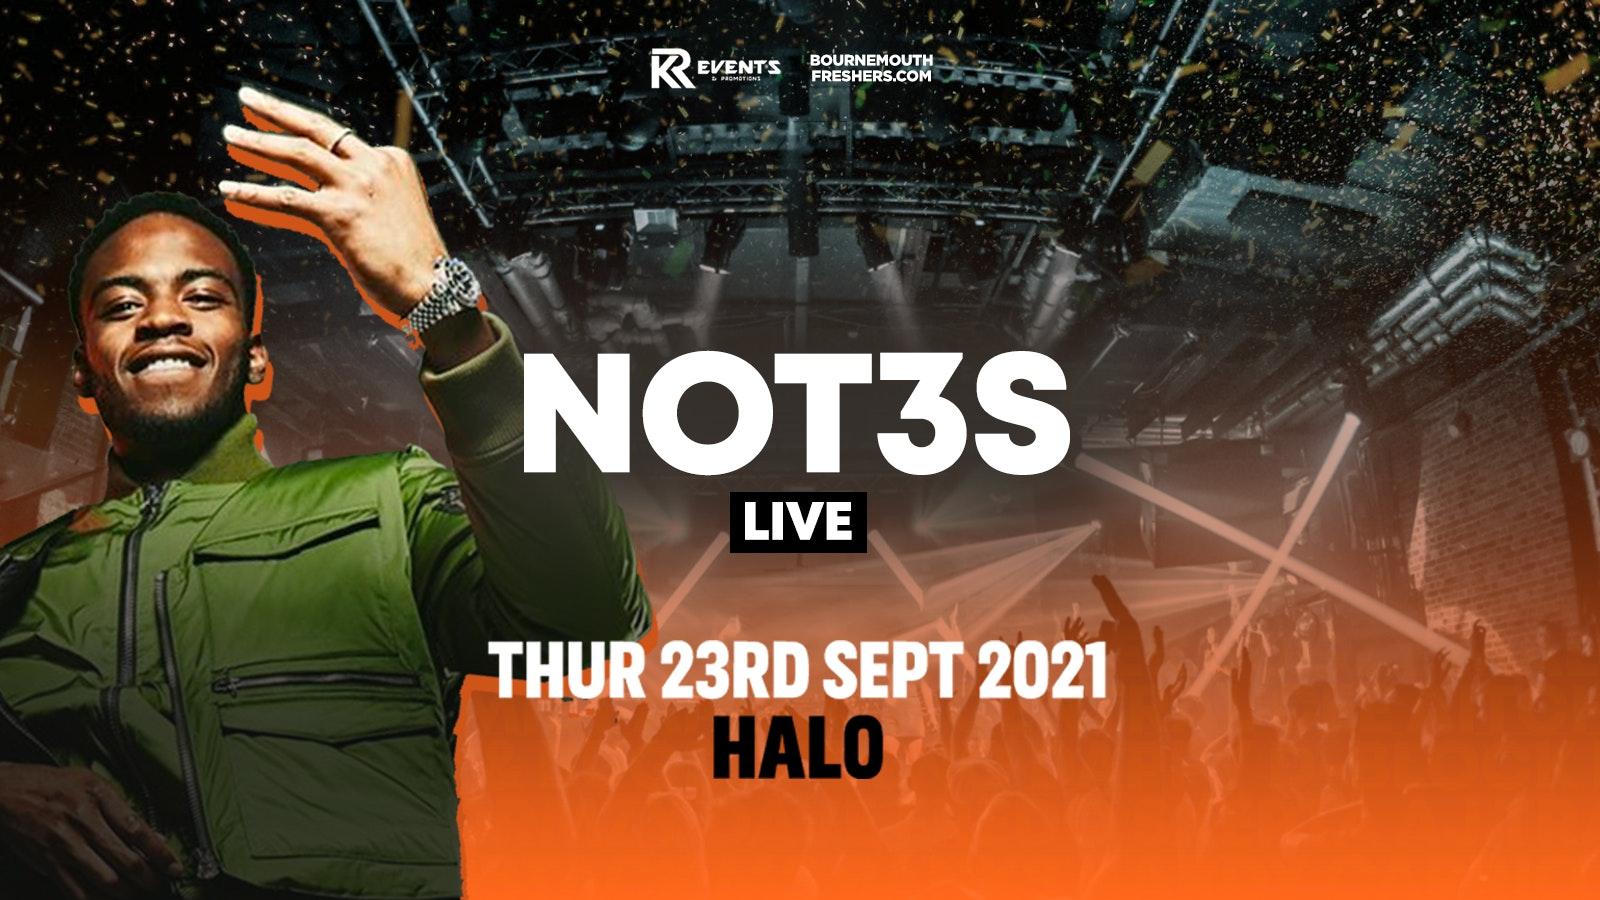 NOT3S LIVE – Halo Thursdays | Bournemouth Freshers 2021  [Week 1 Freshers Event]